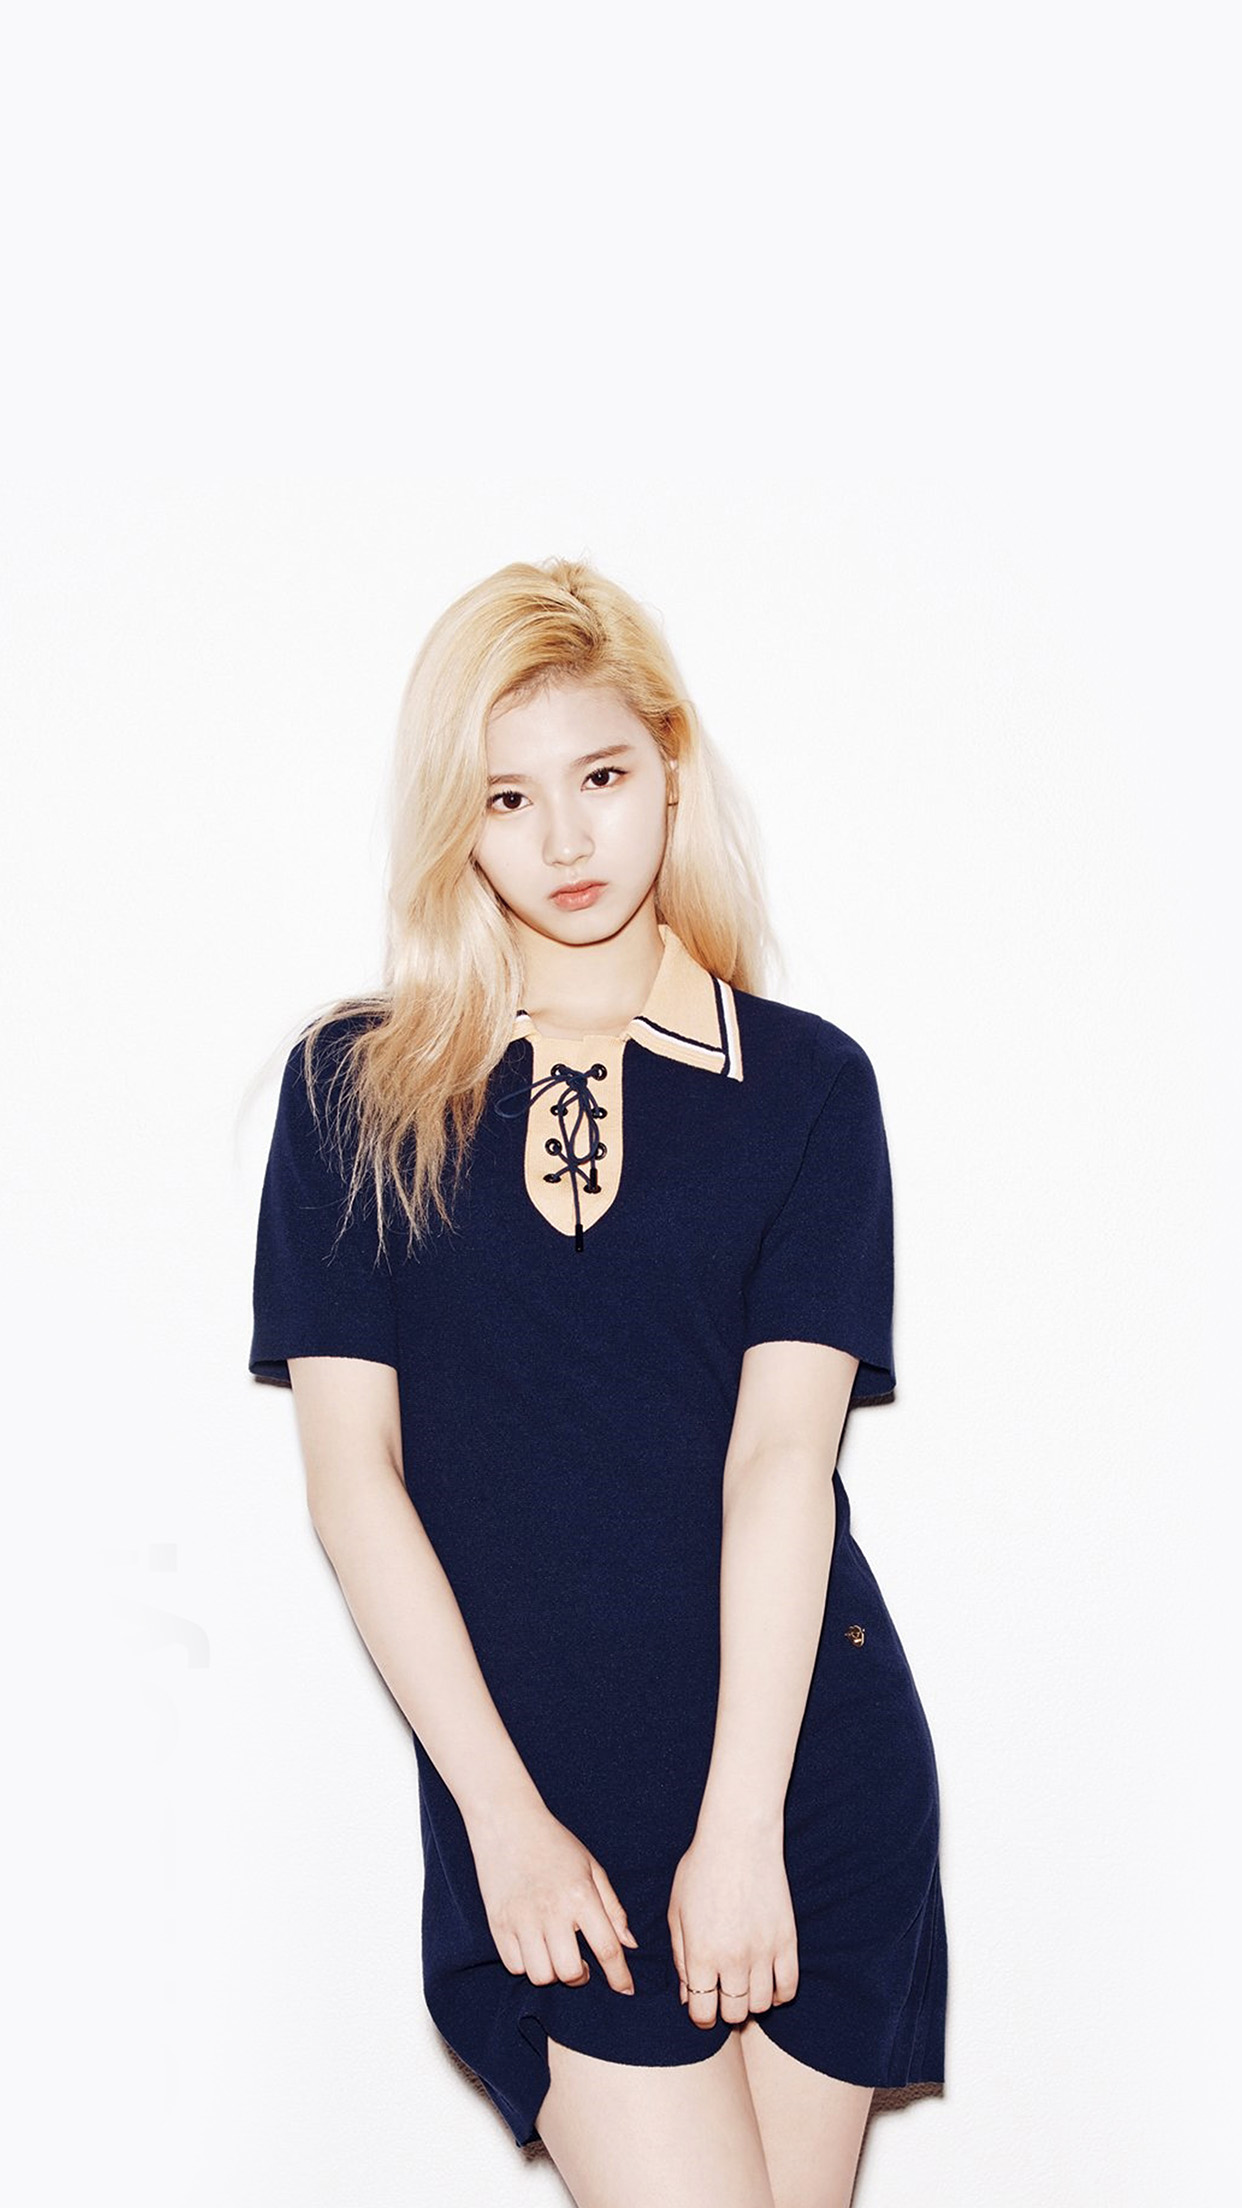 Mlb Iphone Wallpaper Hj37 Kpop Twice Sana Girl Cute White Wallpaper